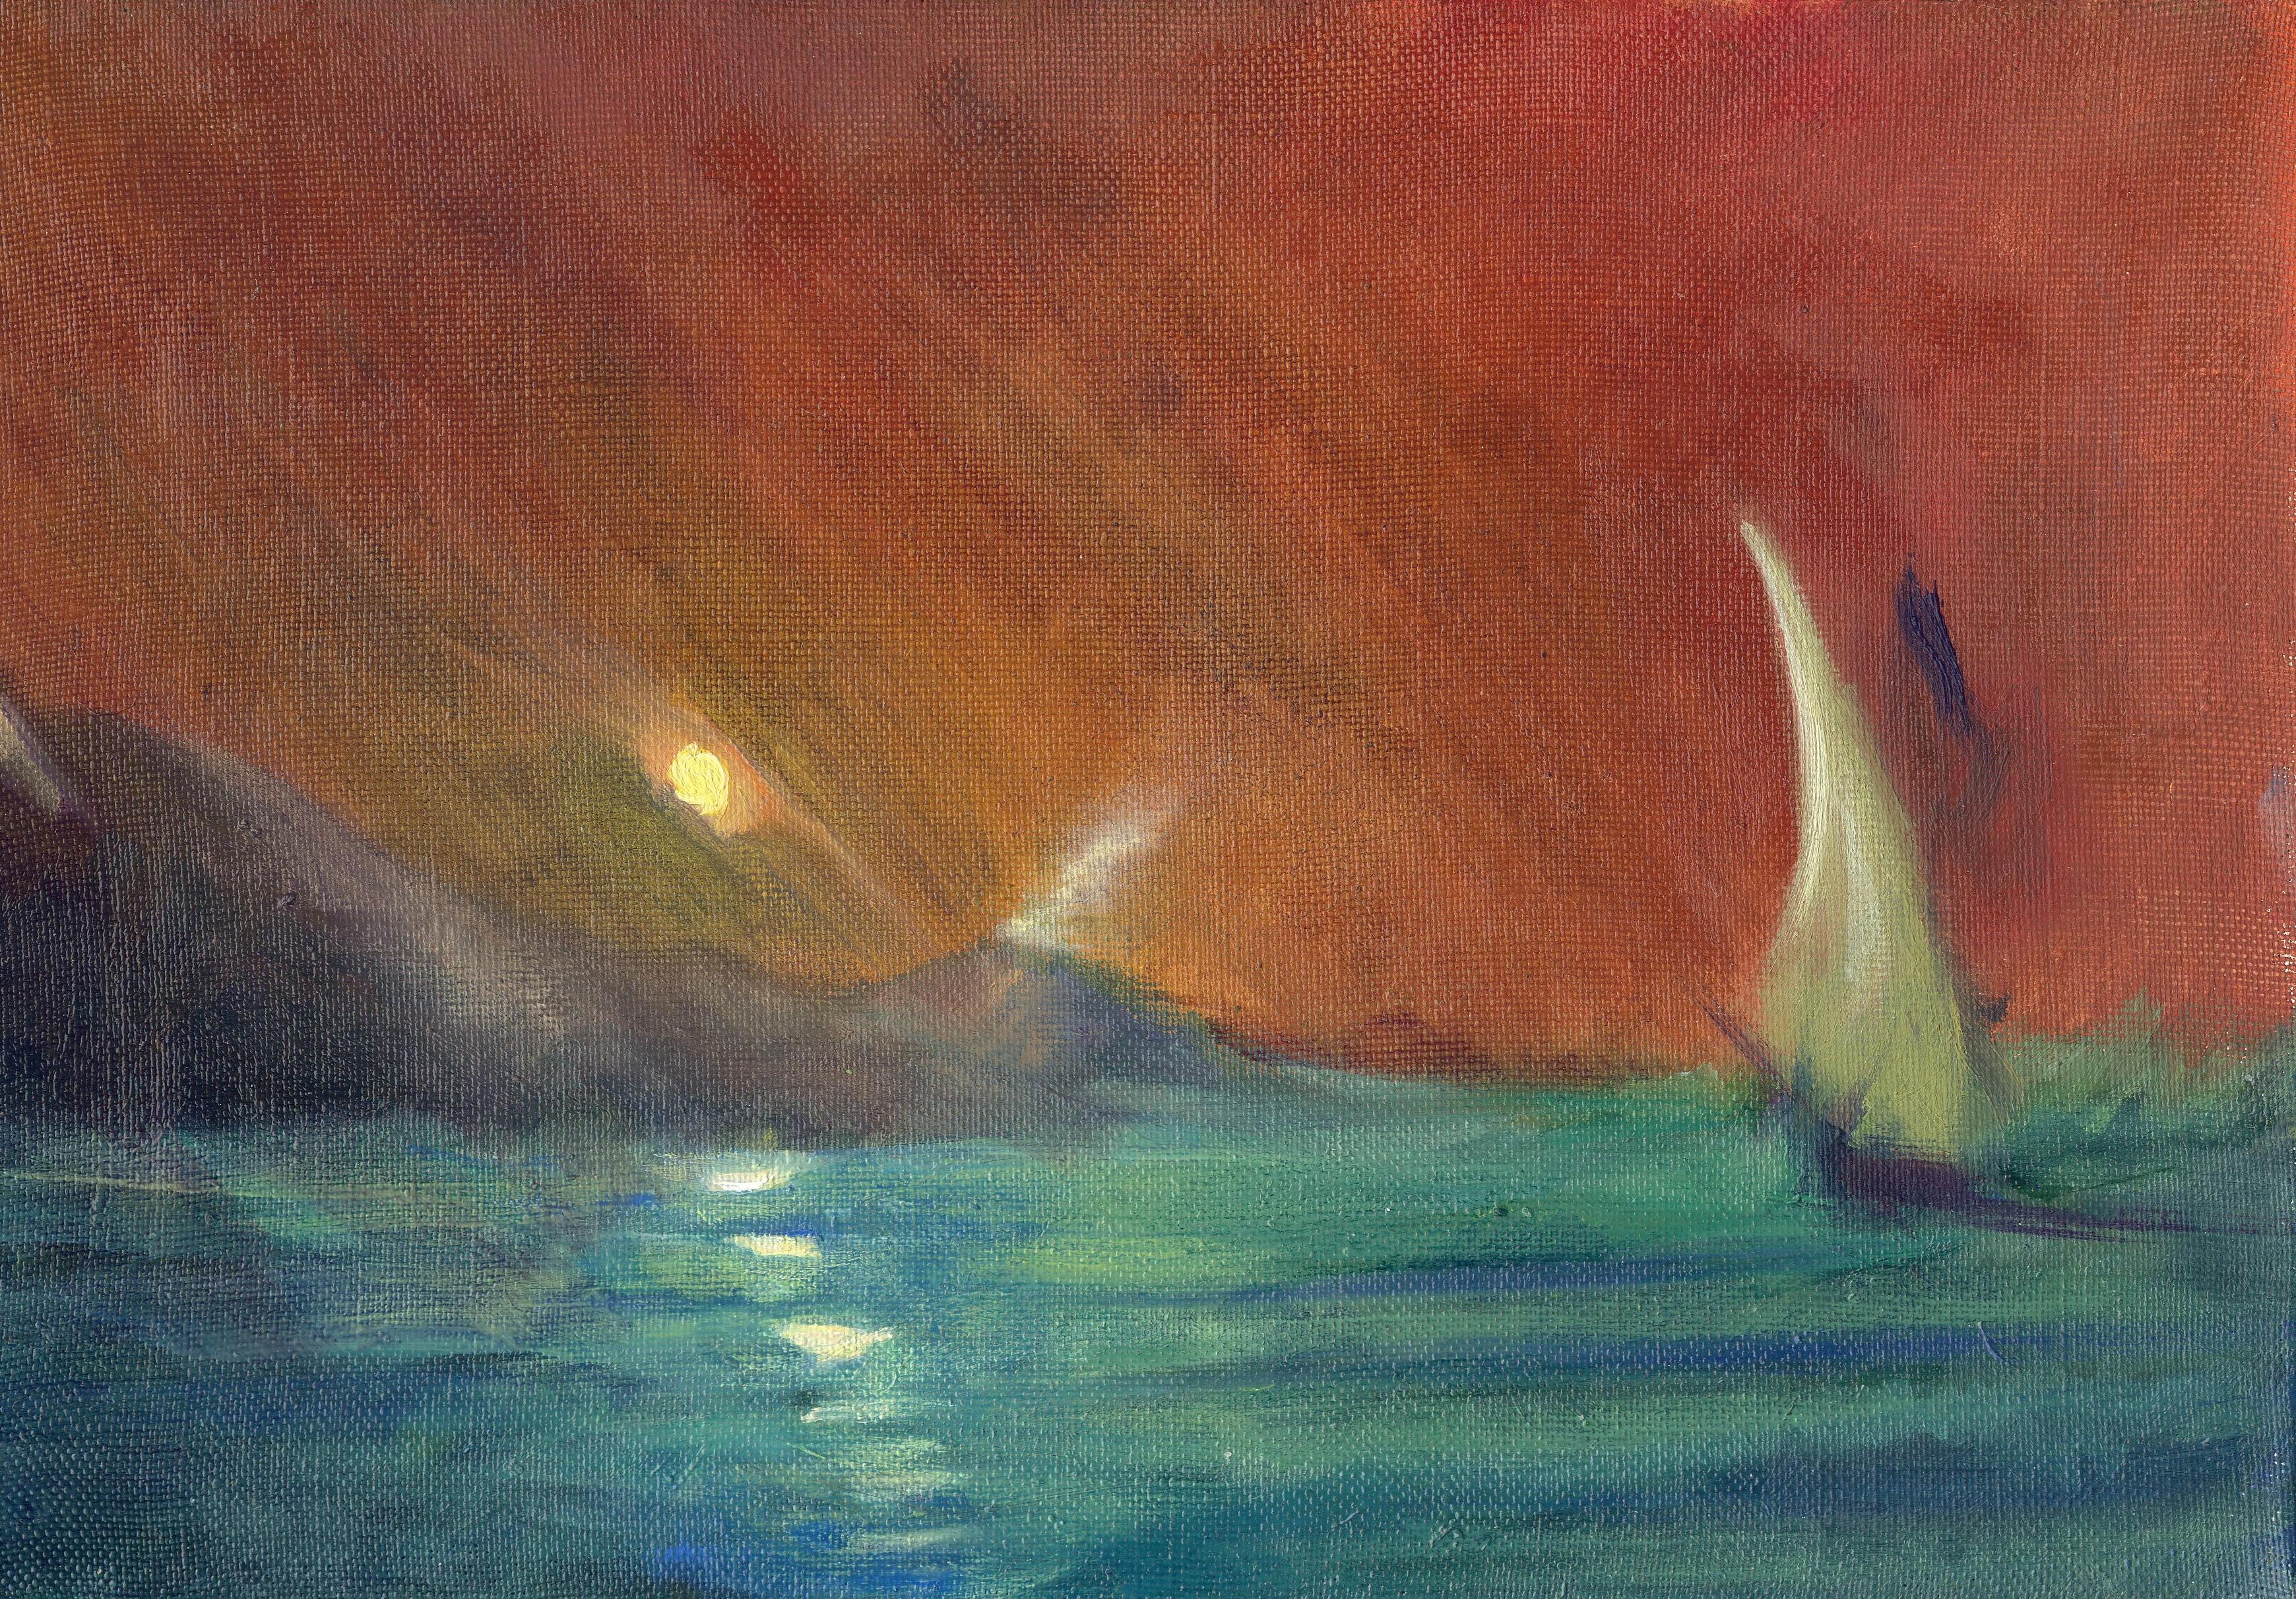 Sea Sunset 21x30 cm, oil on canvas, 2013